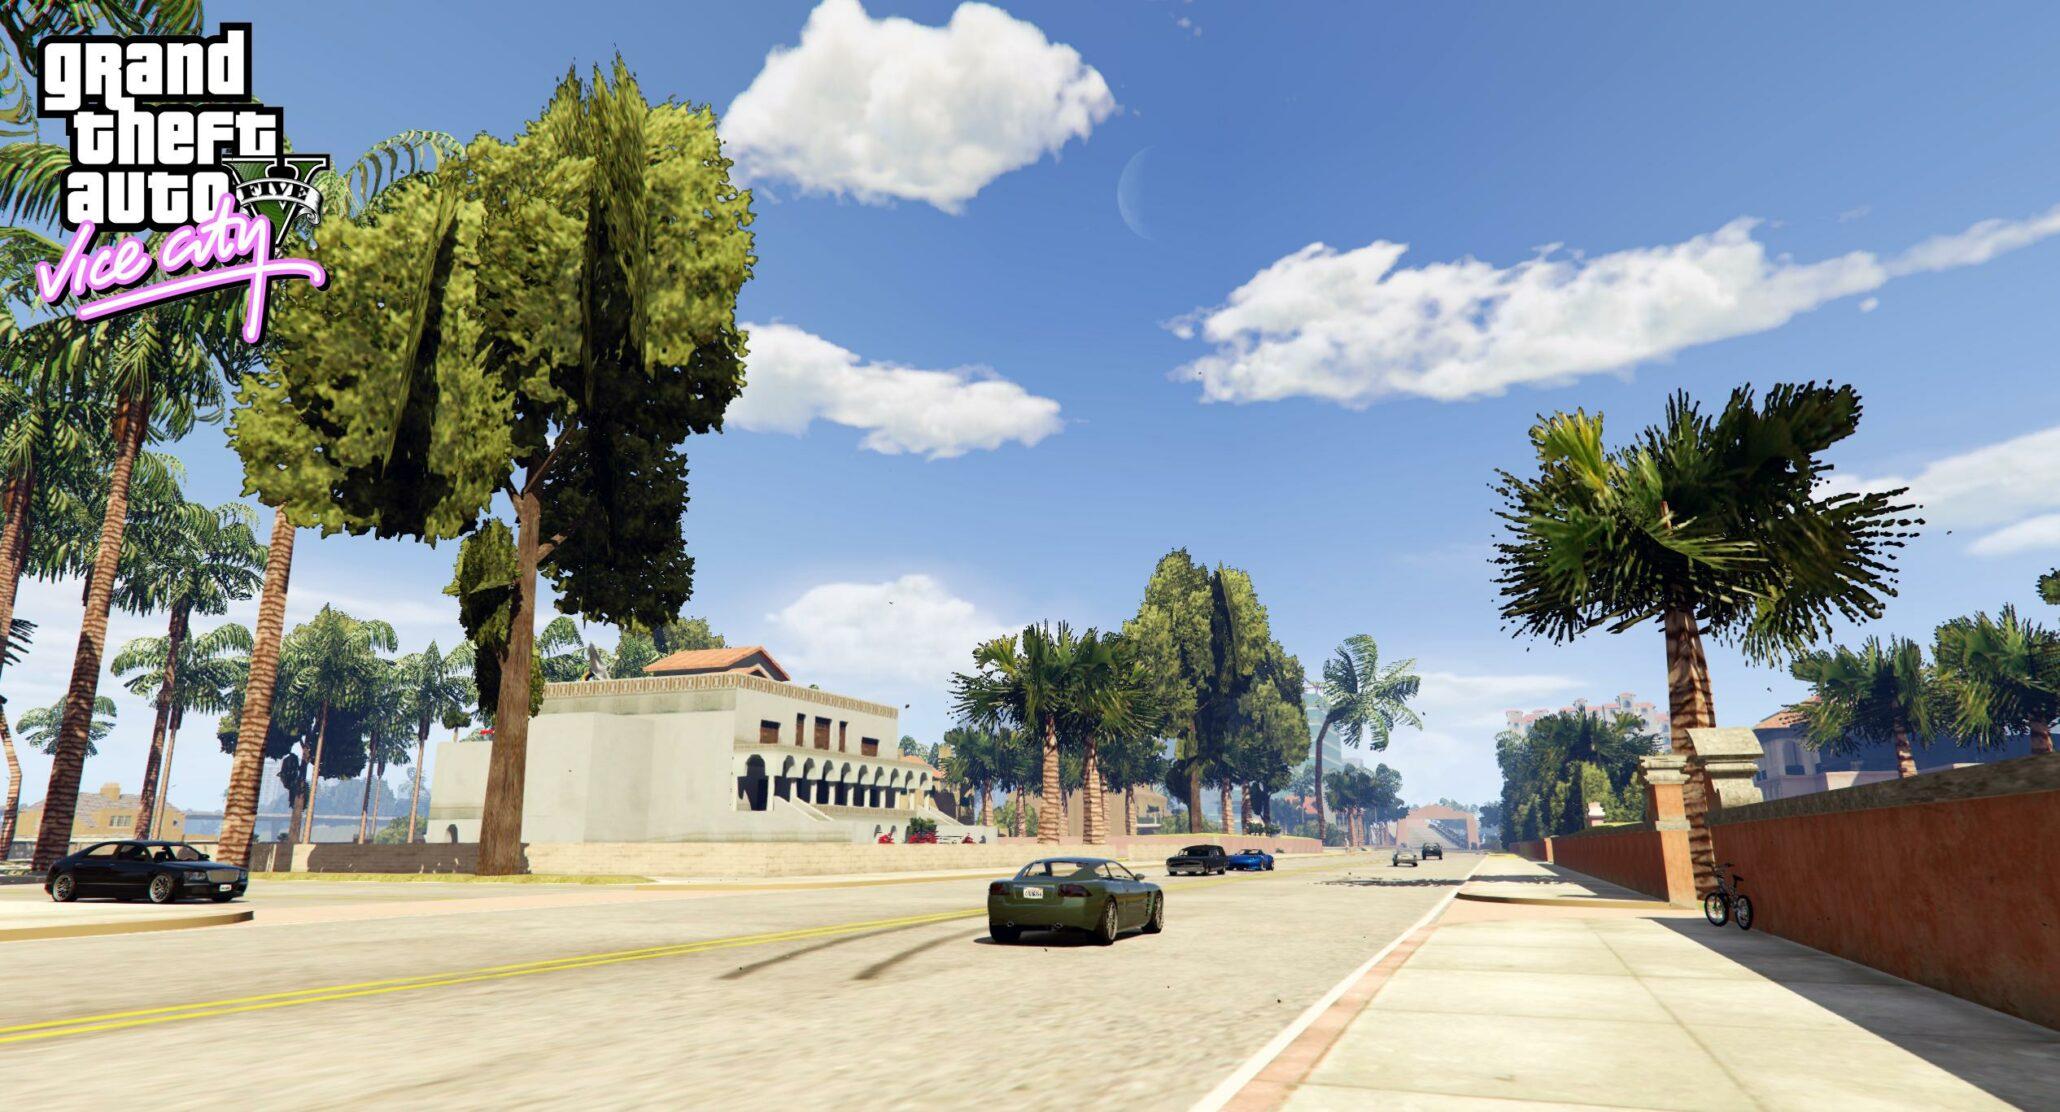 Grand Theft Auto V New Mod To Introduce GTA III Libery City, Vice